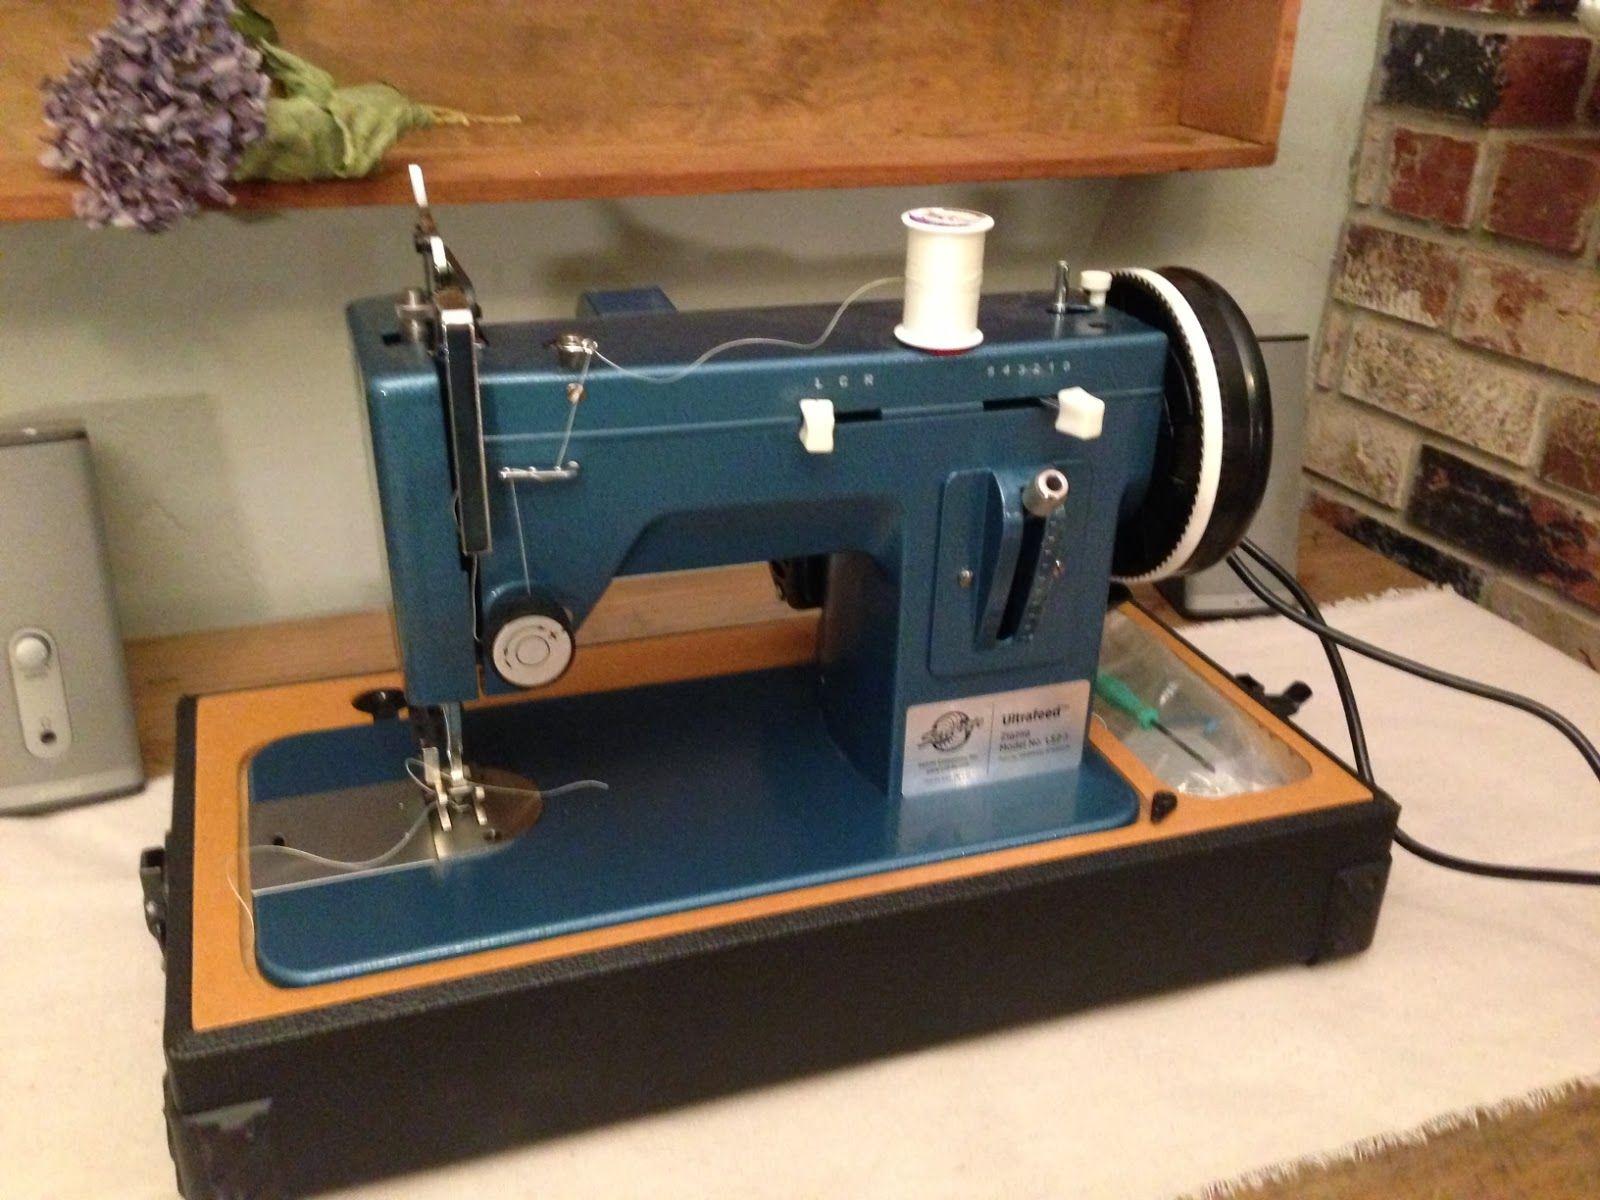 Upholstery Sewing Machine >> Sailrite Lsz 1 Upholstery Sewing Machine Review Sewing Projects